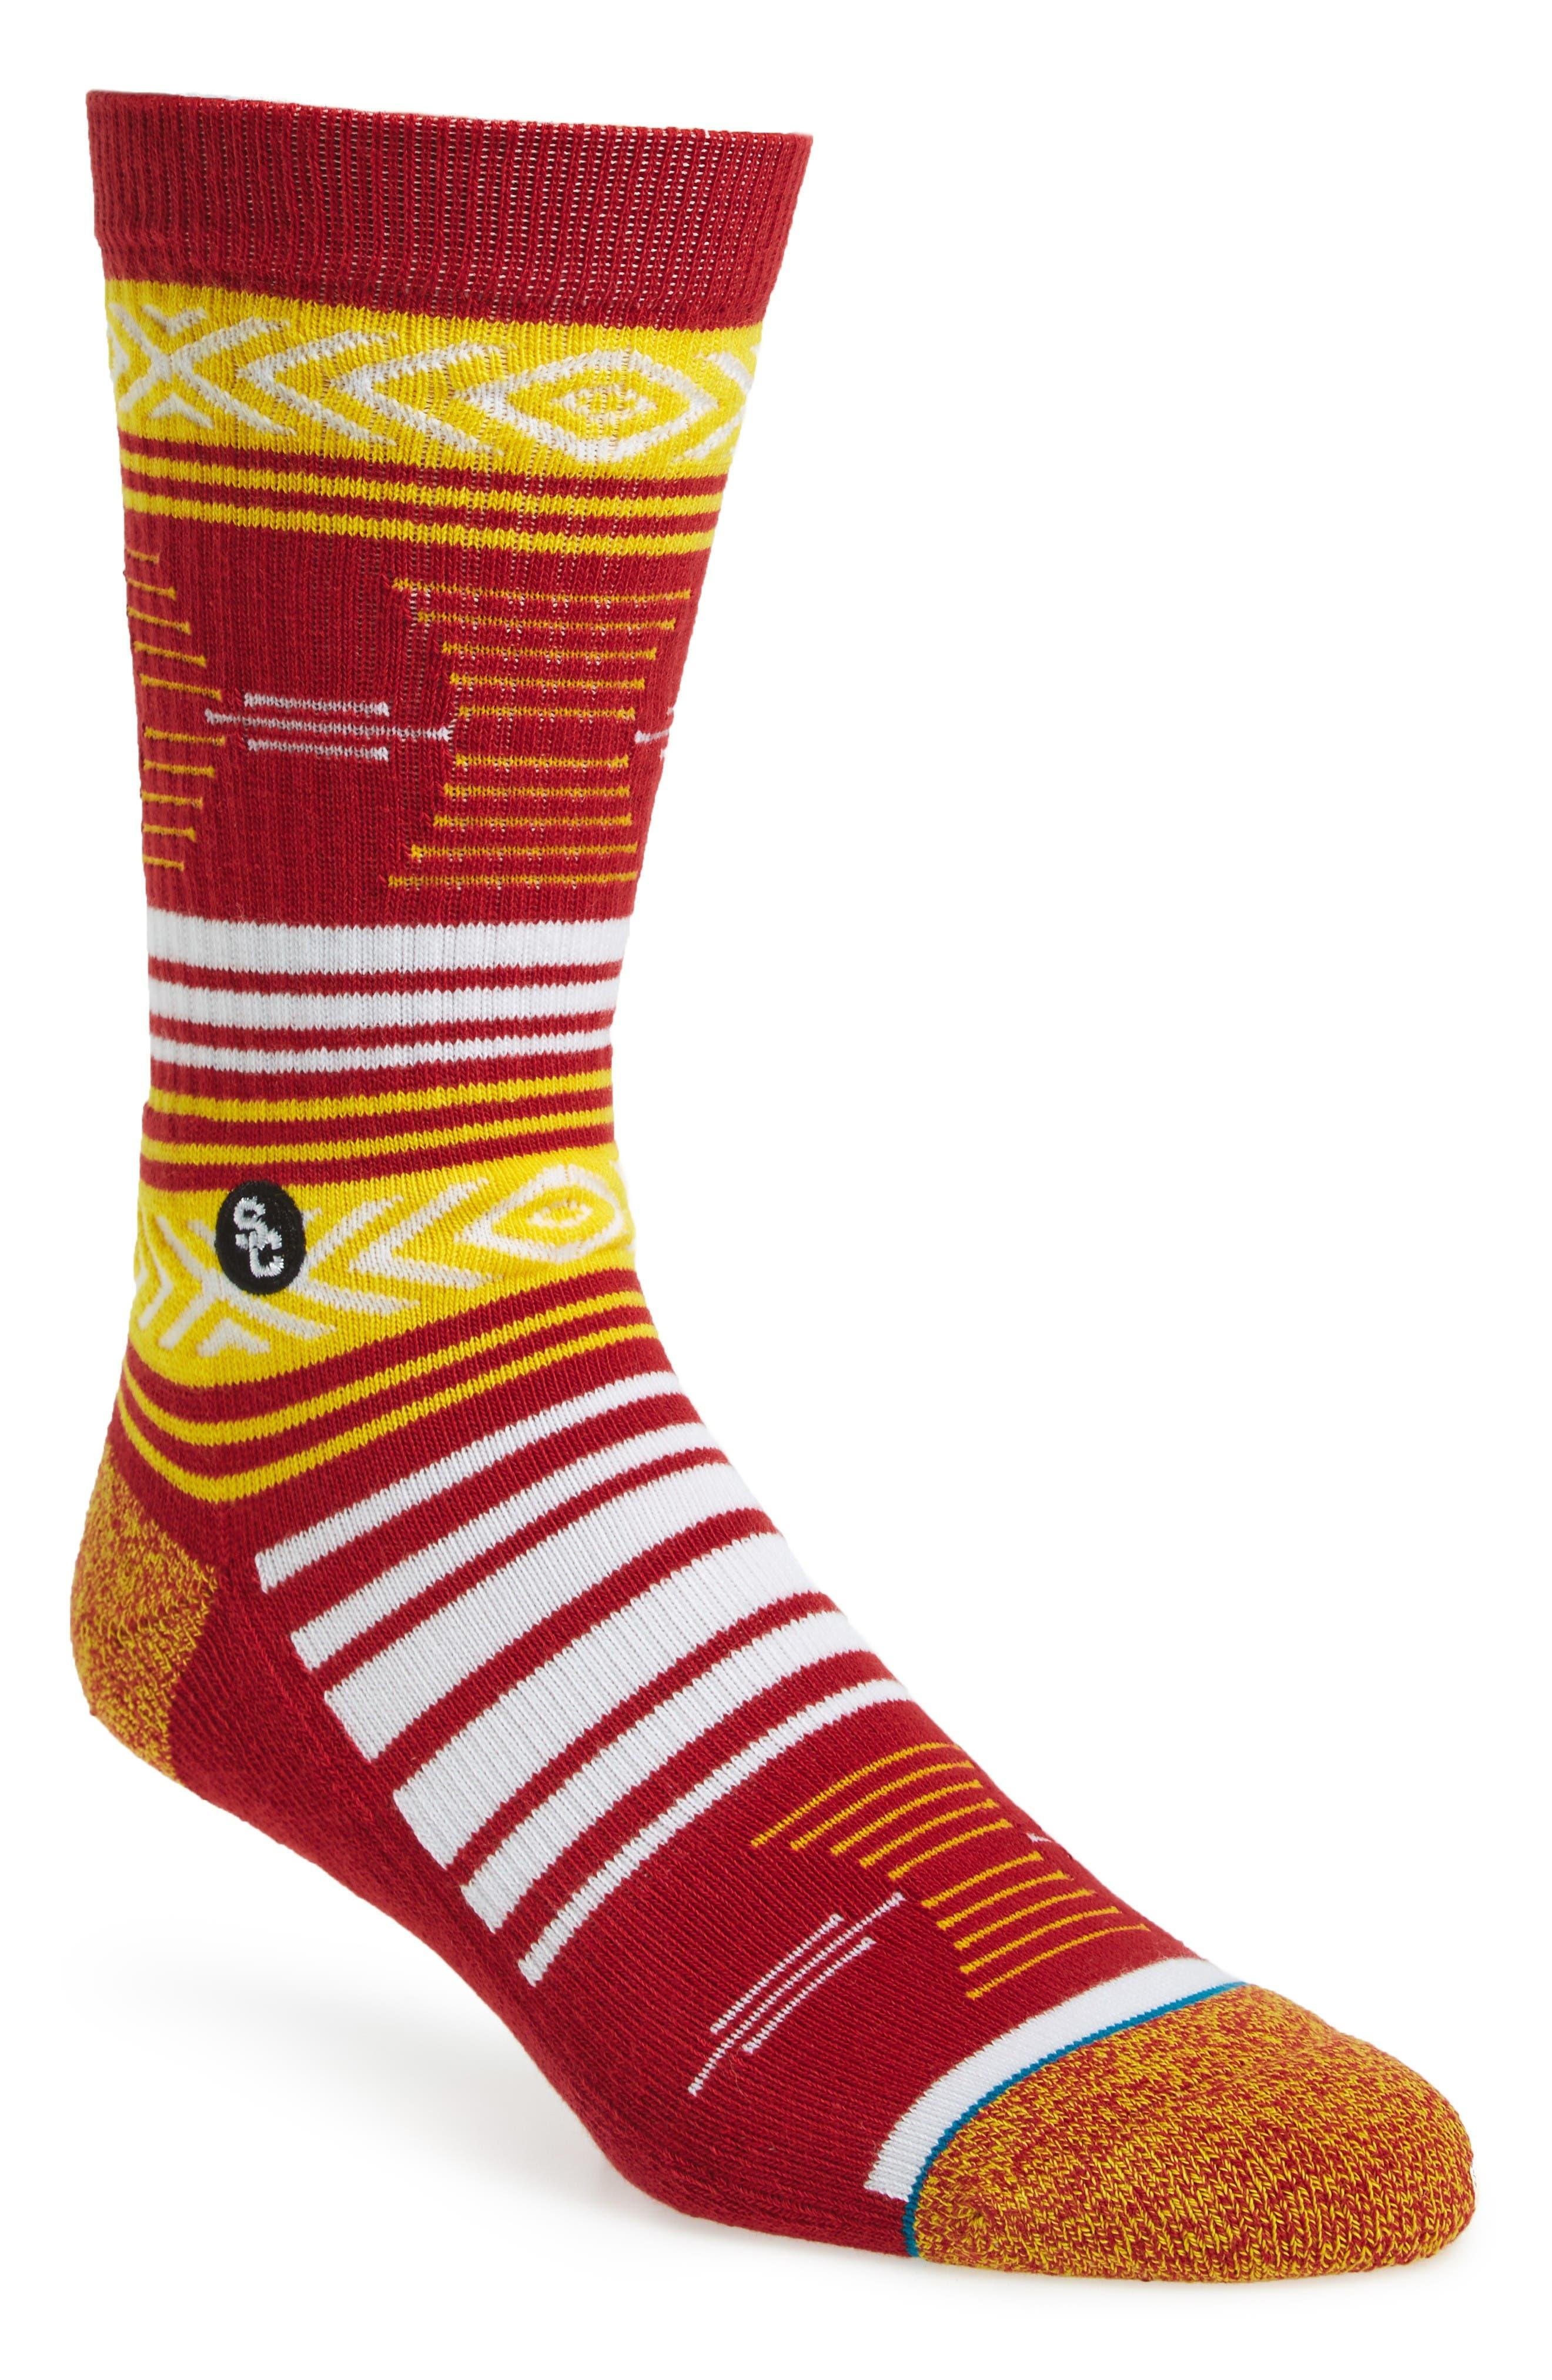 Alternate Image 1 Selected - Stance Mazed USC Trojans Socks